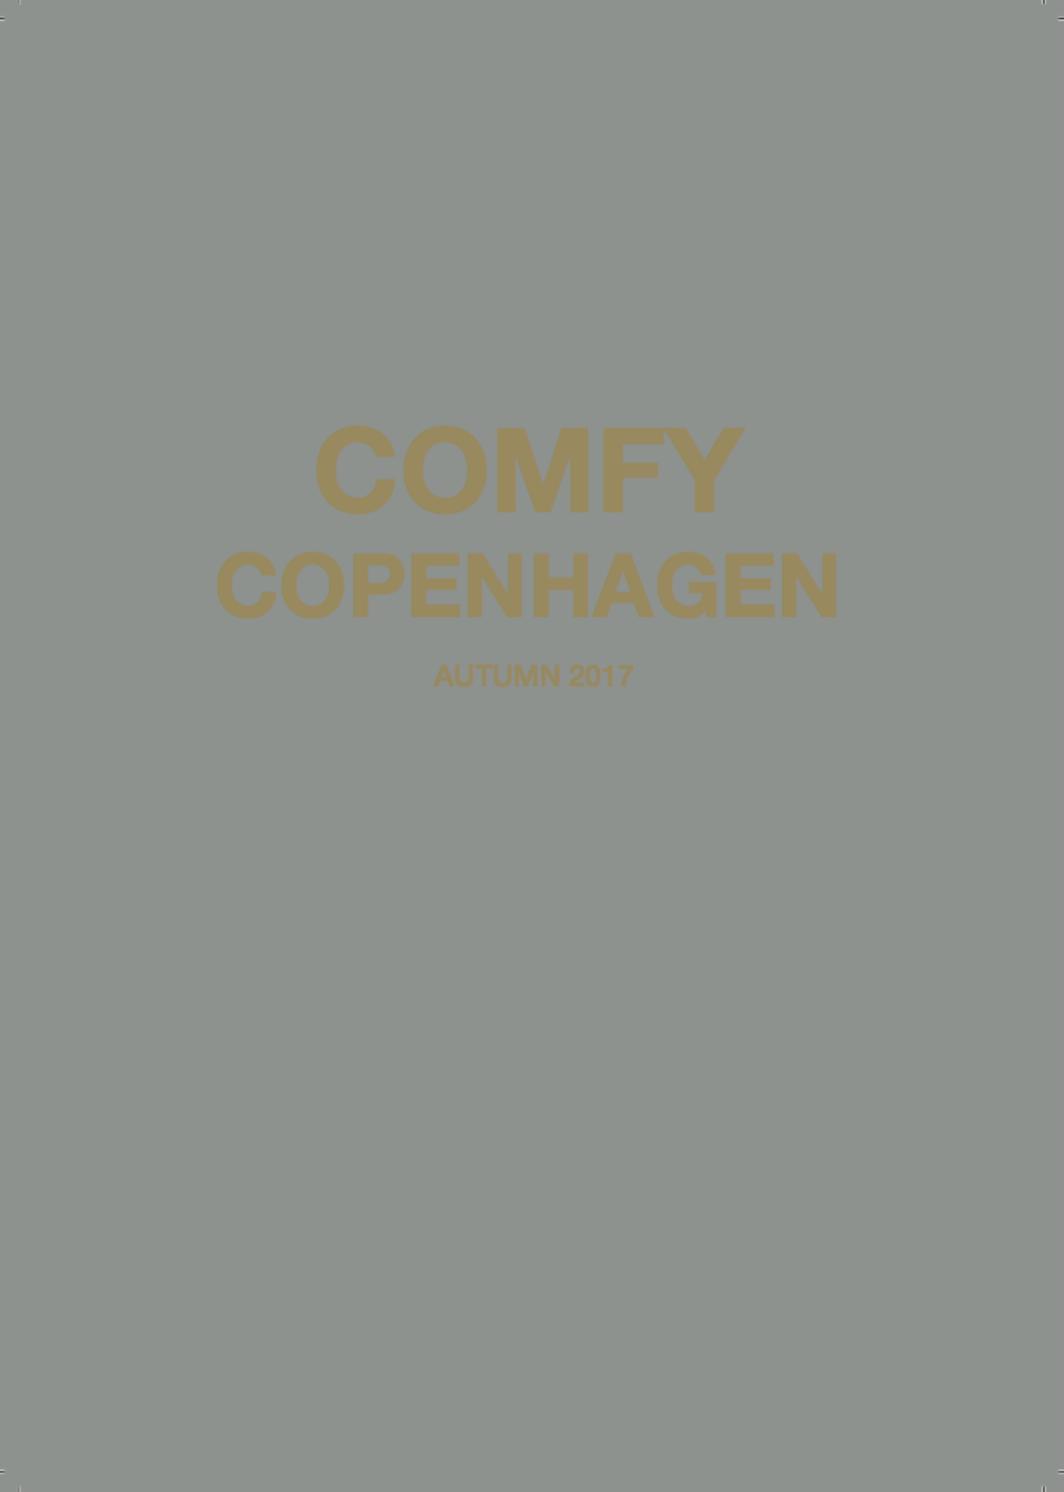 1456e19eda Autumn 2017 Lookbook by COMFY COPENHAGEN - issuu